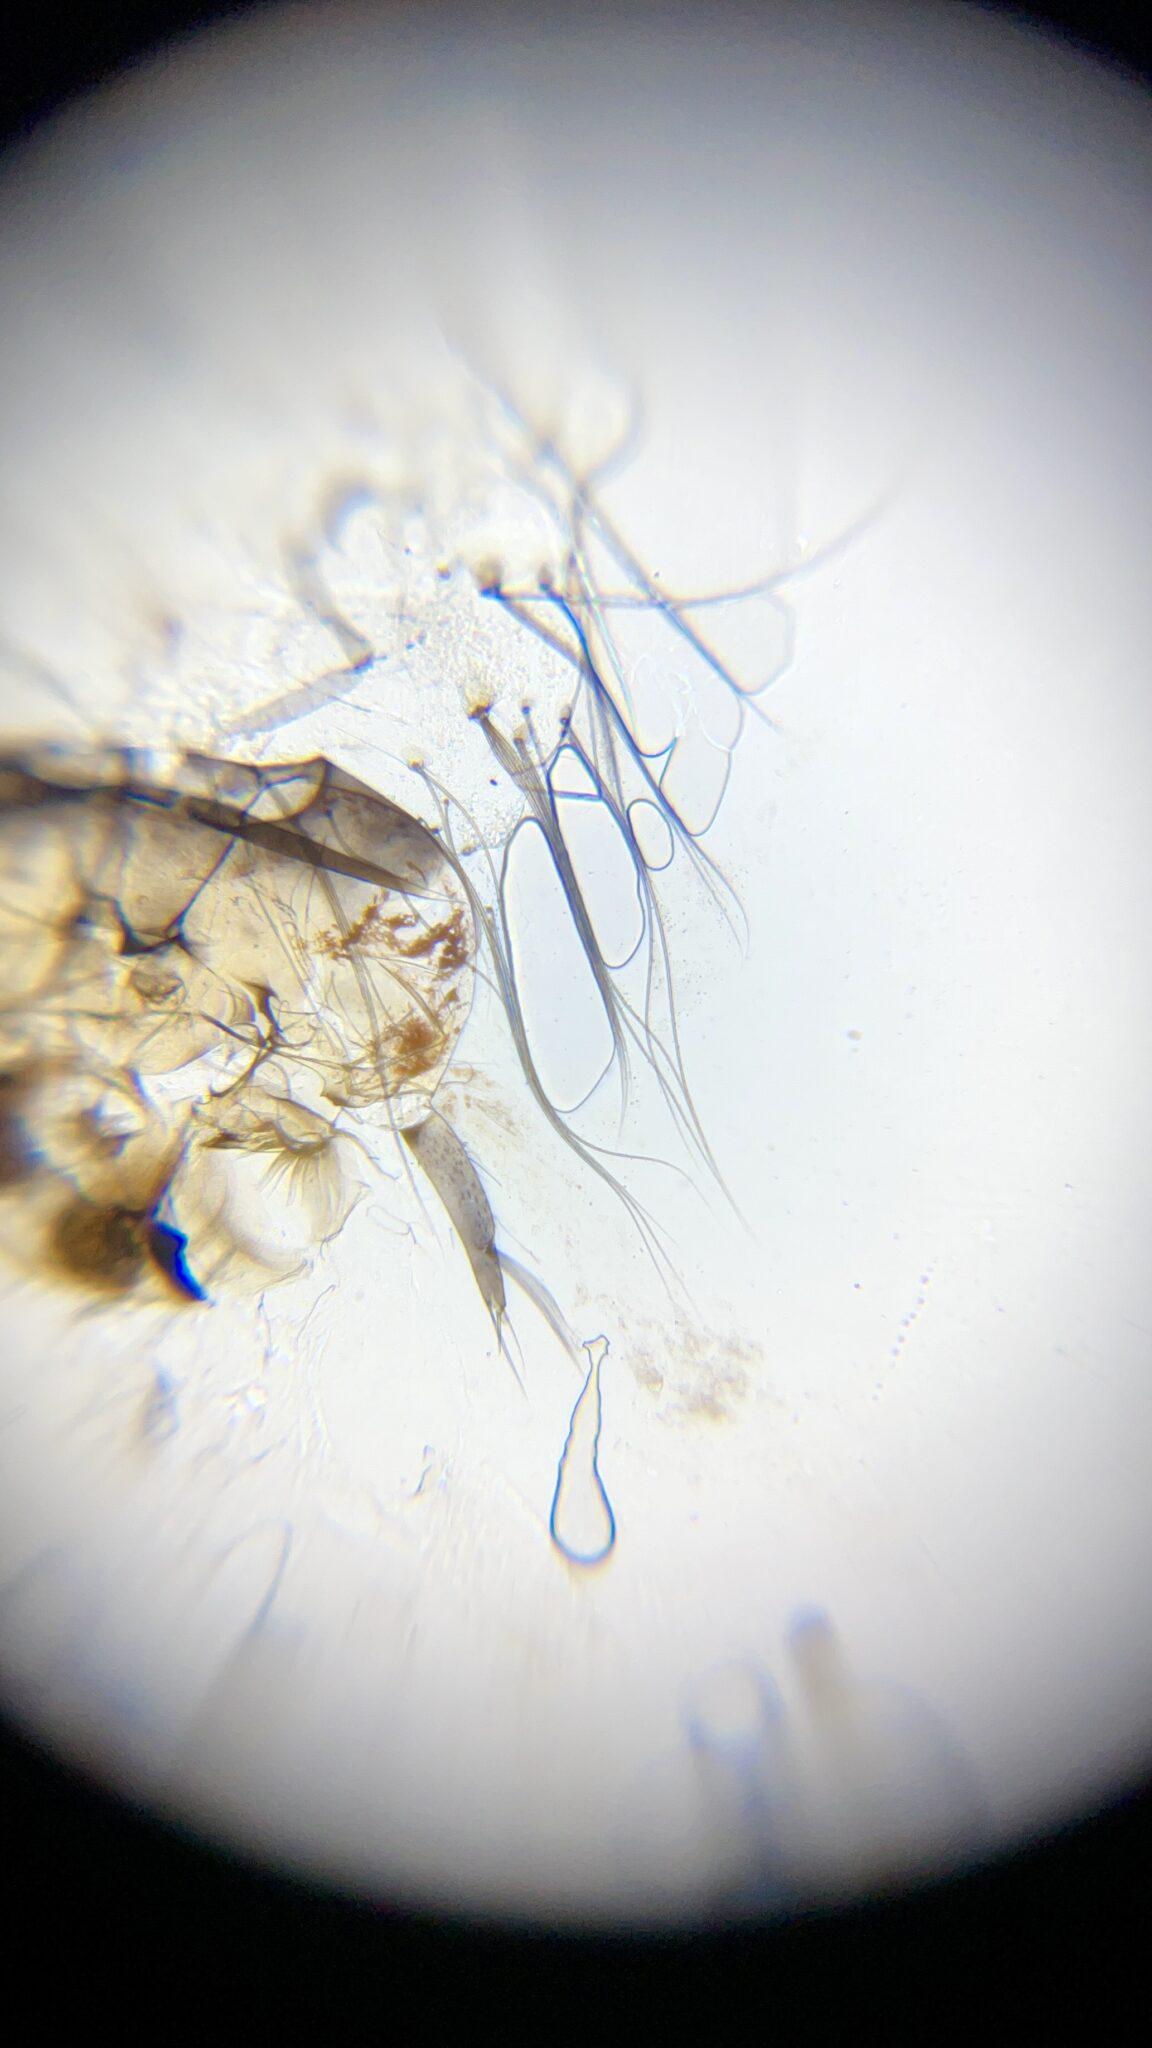 Mosquito Larvae Microscope